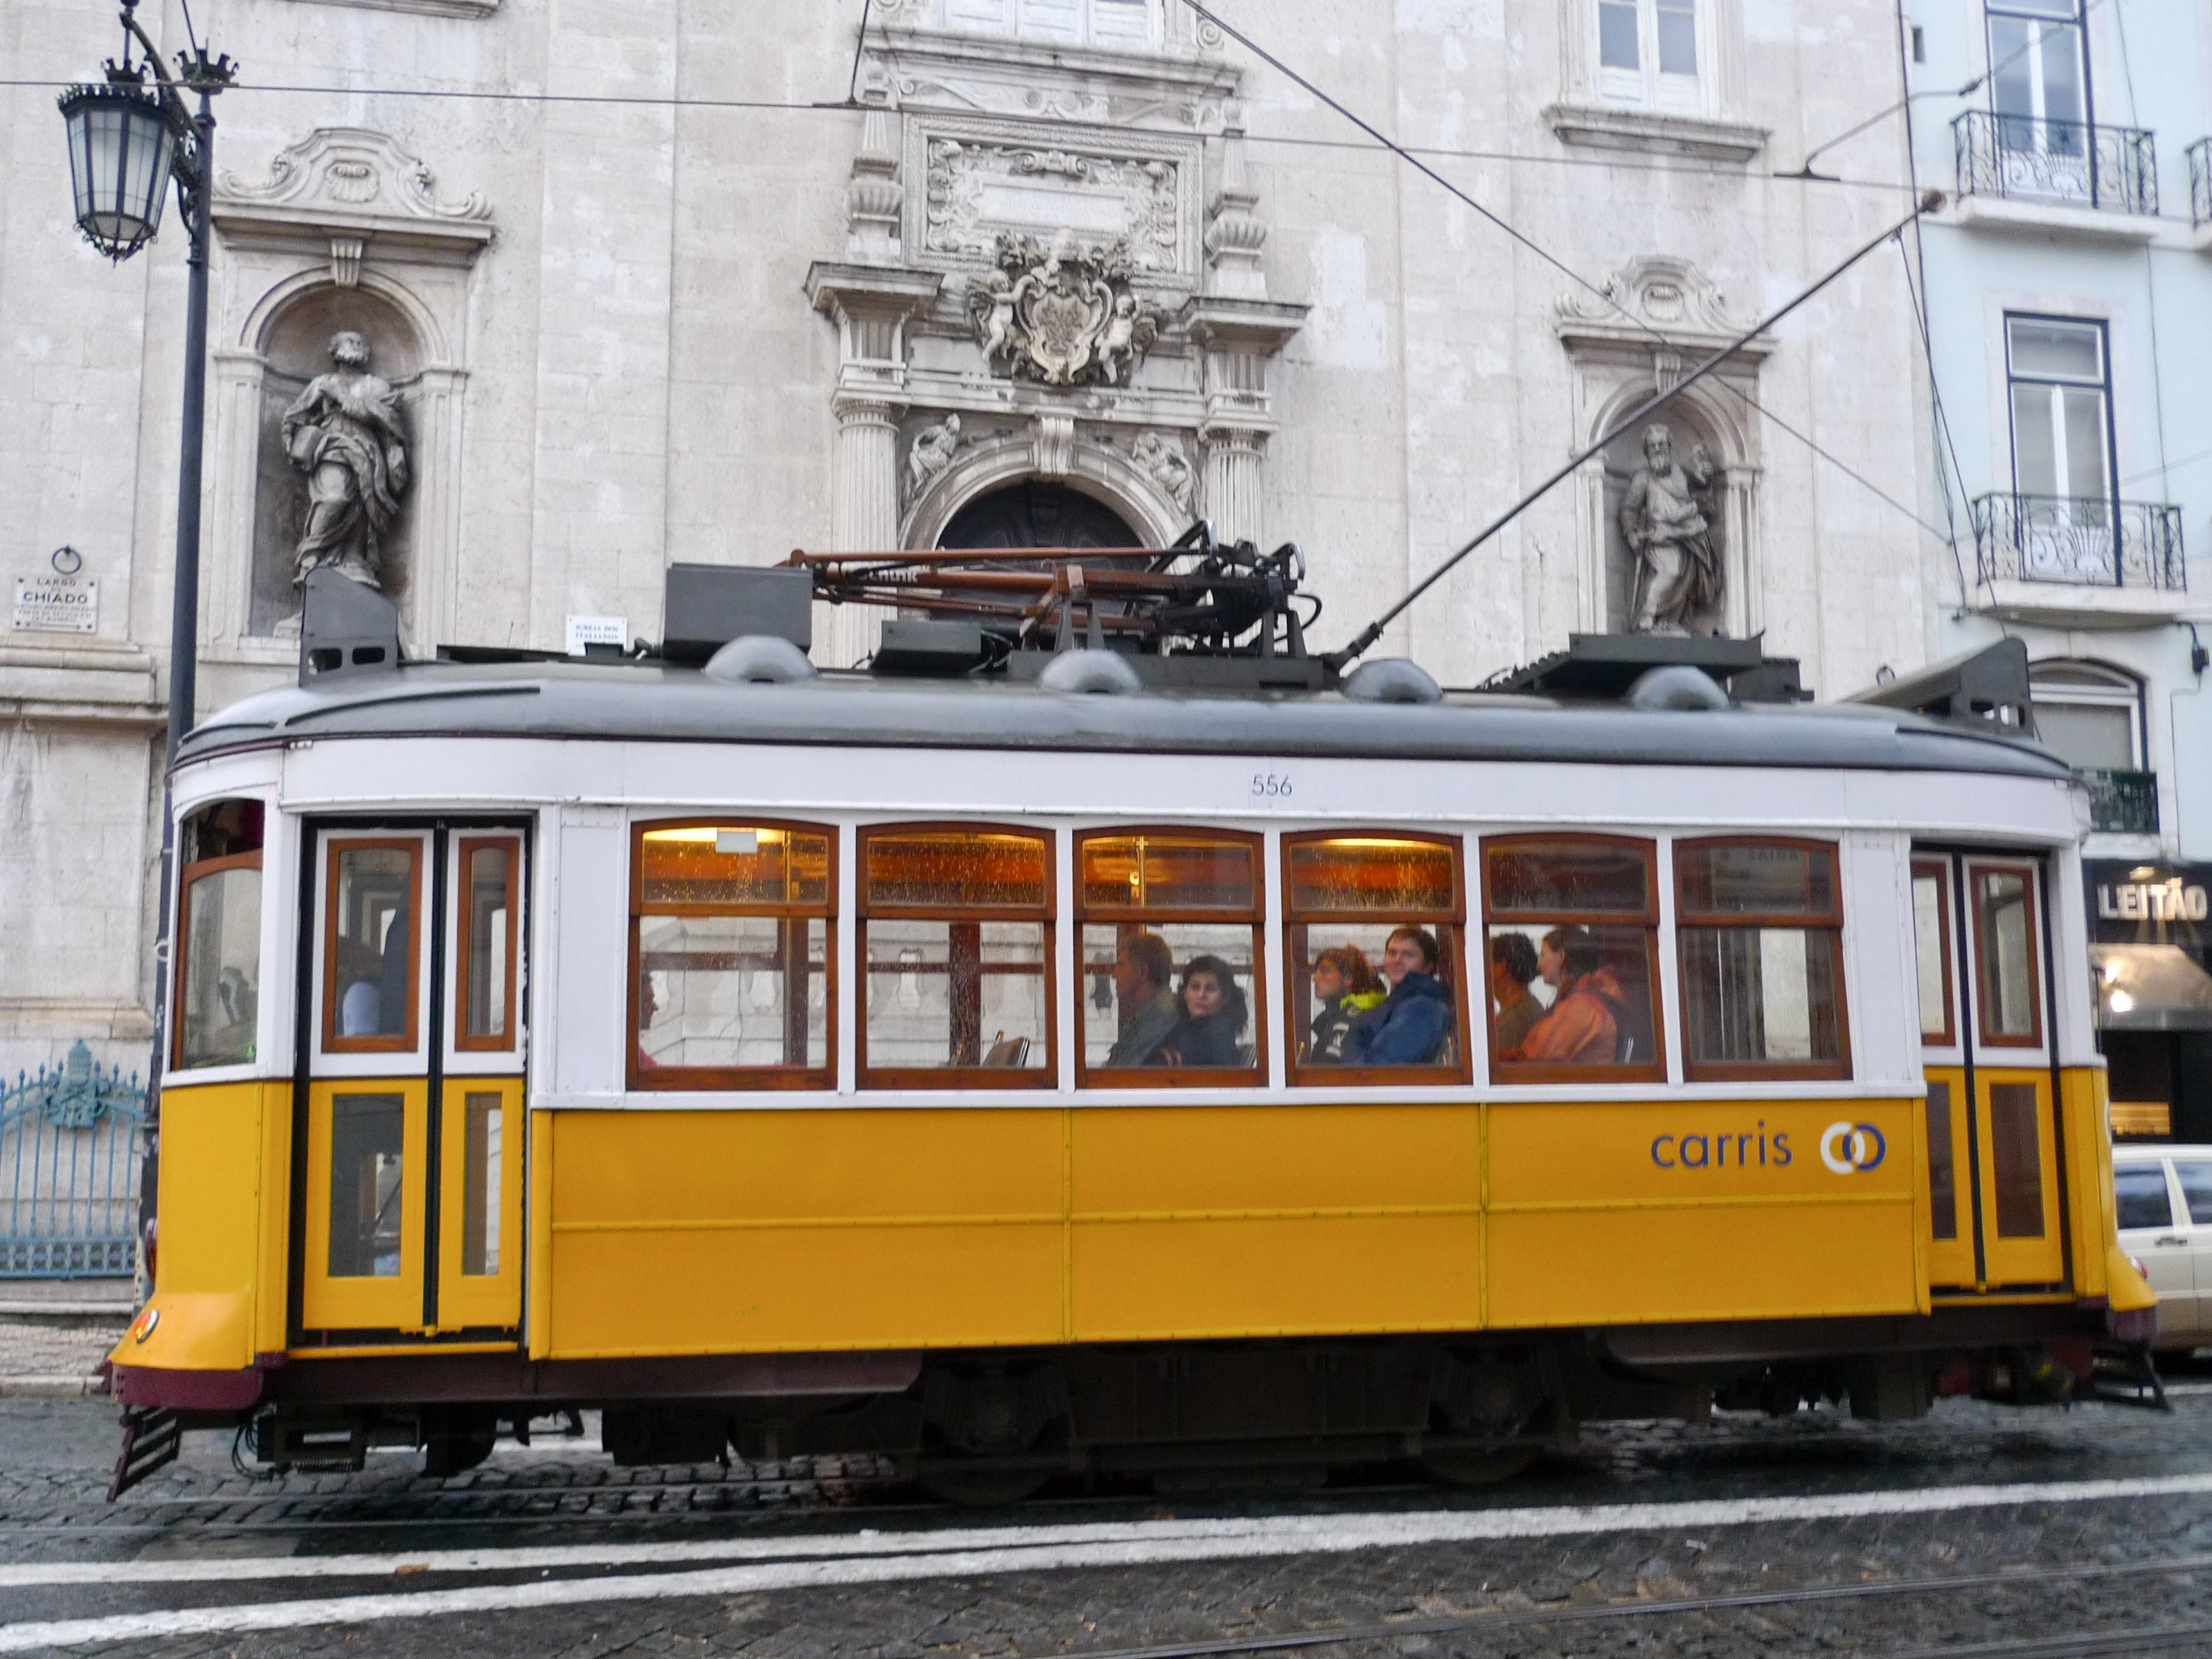 A_yellow_tram_near_Baixa_Chiado_Lisbon